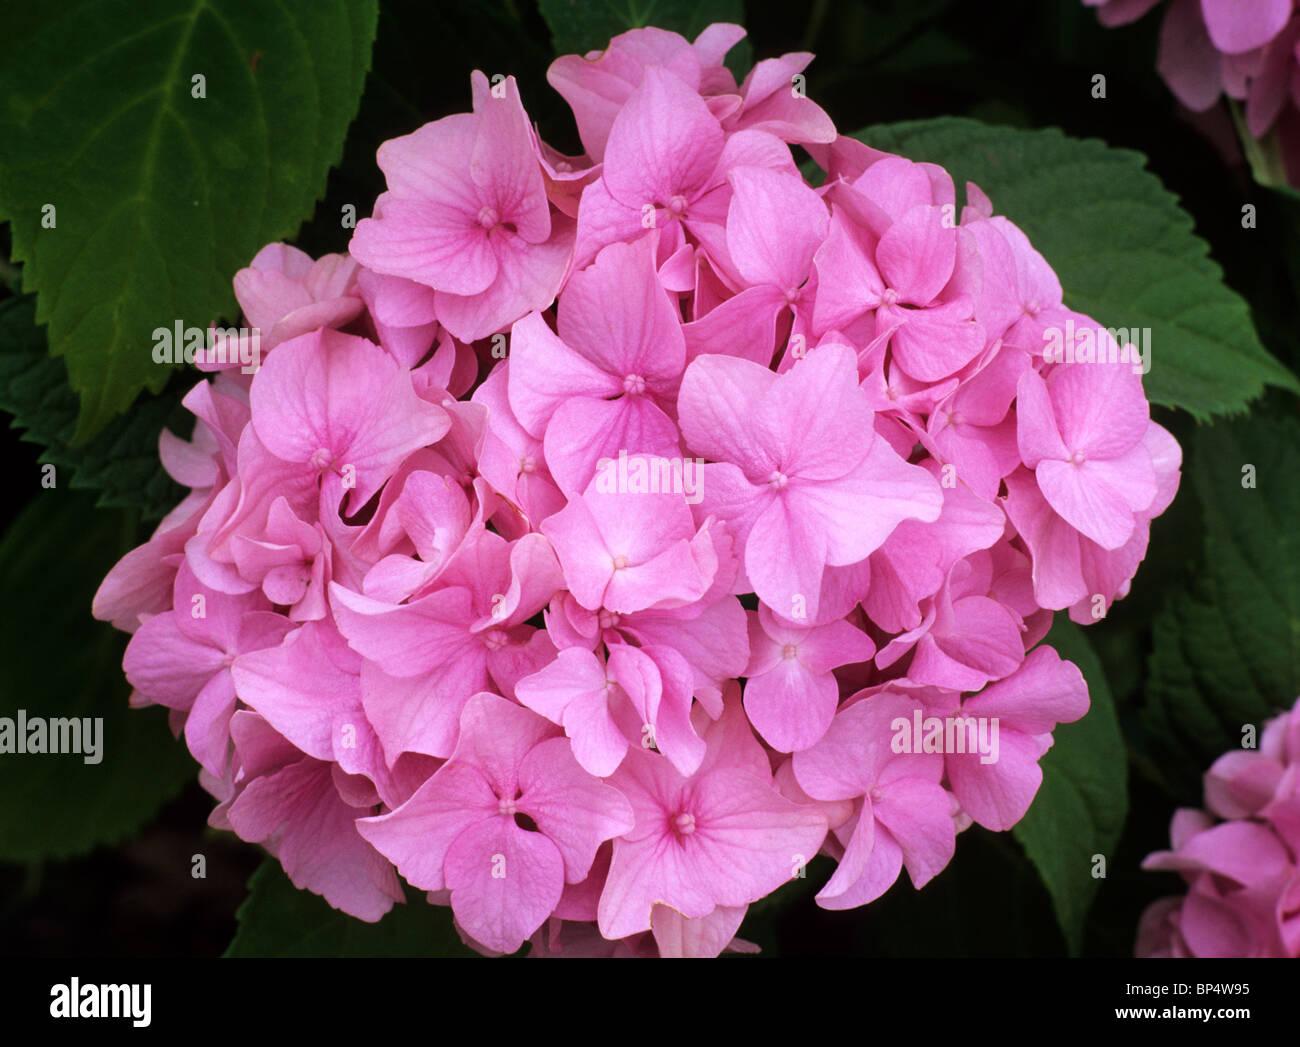 Hydrangea Macrophylla Bouquet Rose Pink Flower Flowers Garden